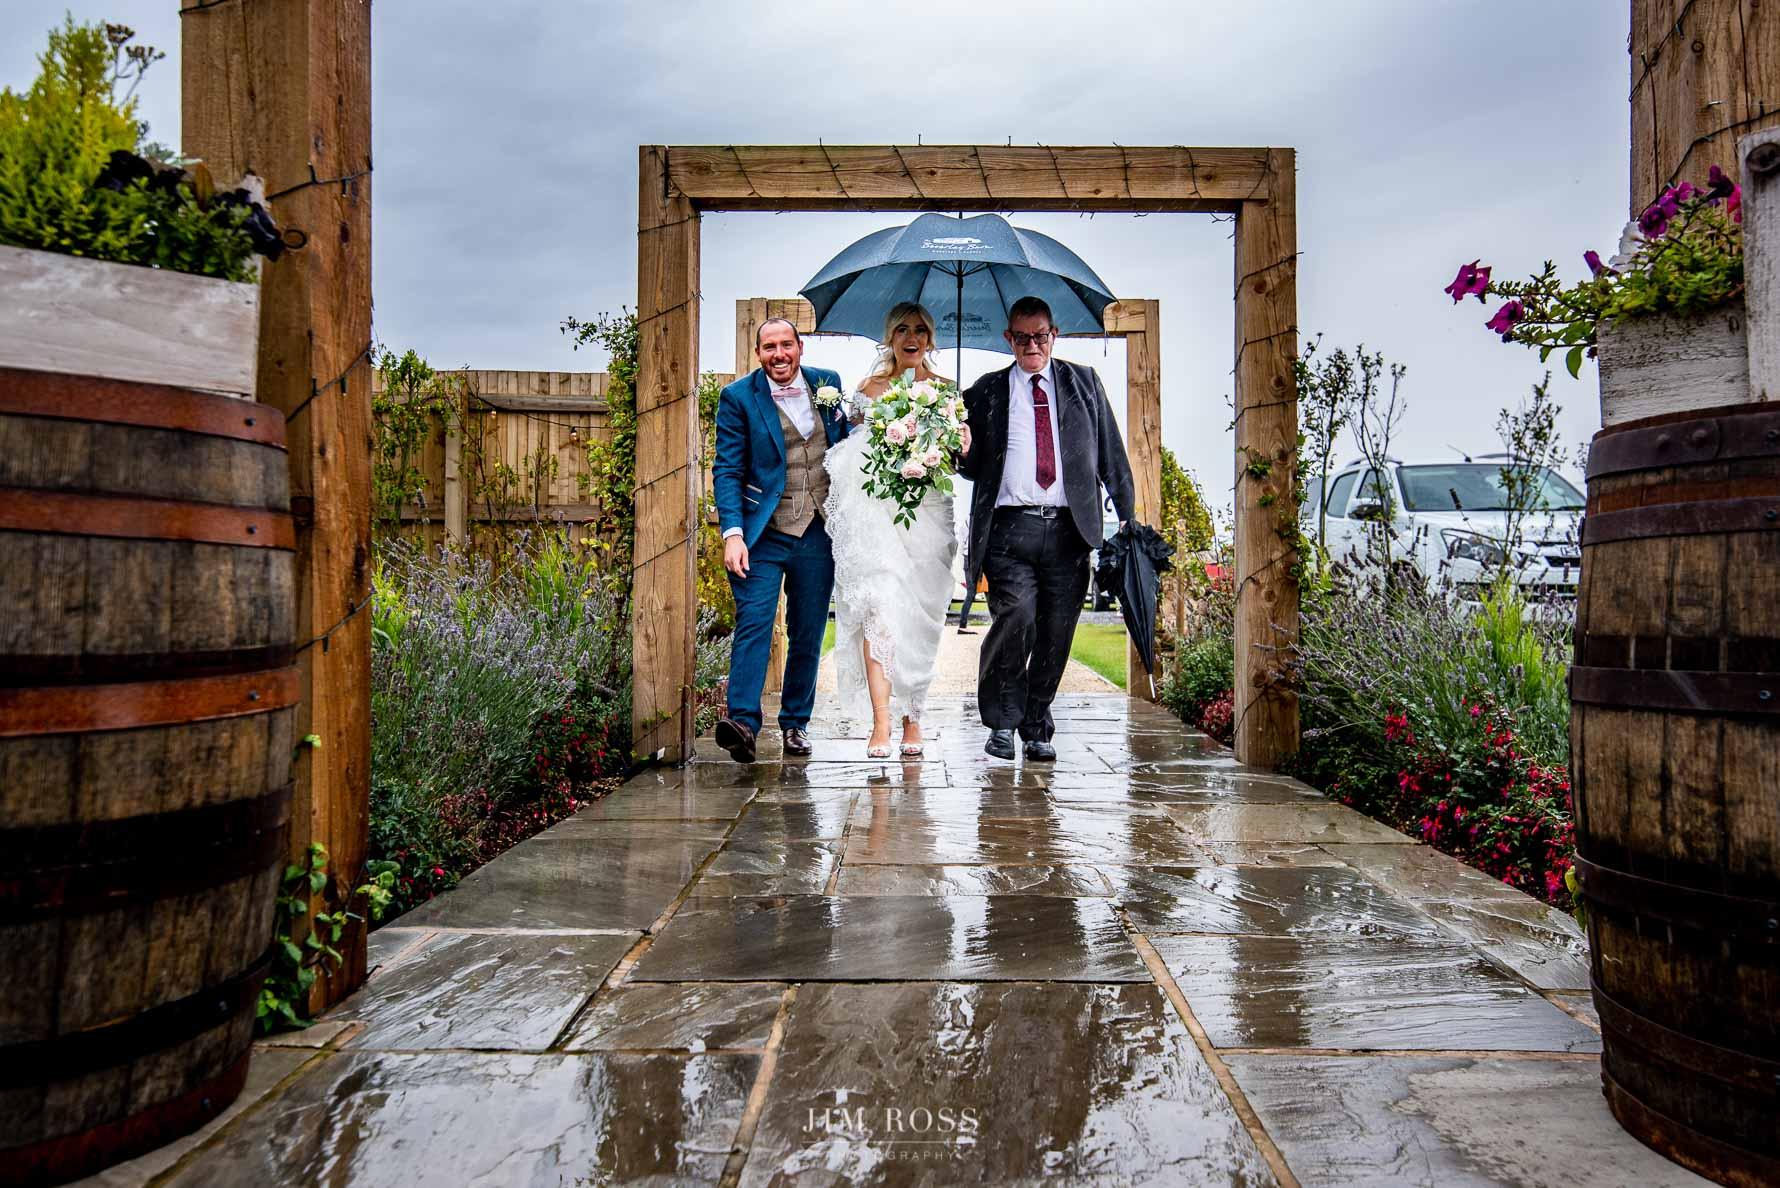 Couple arrive in the rain